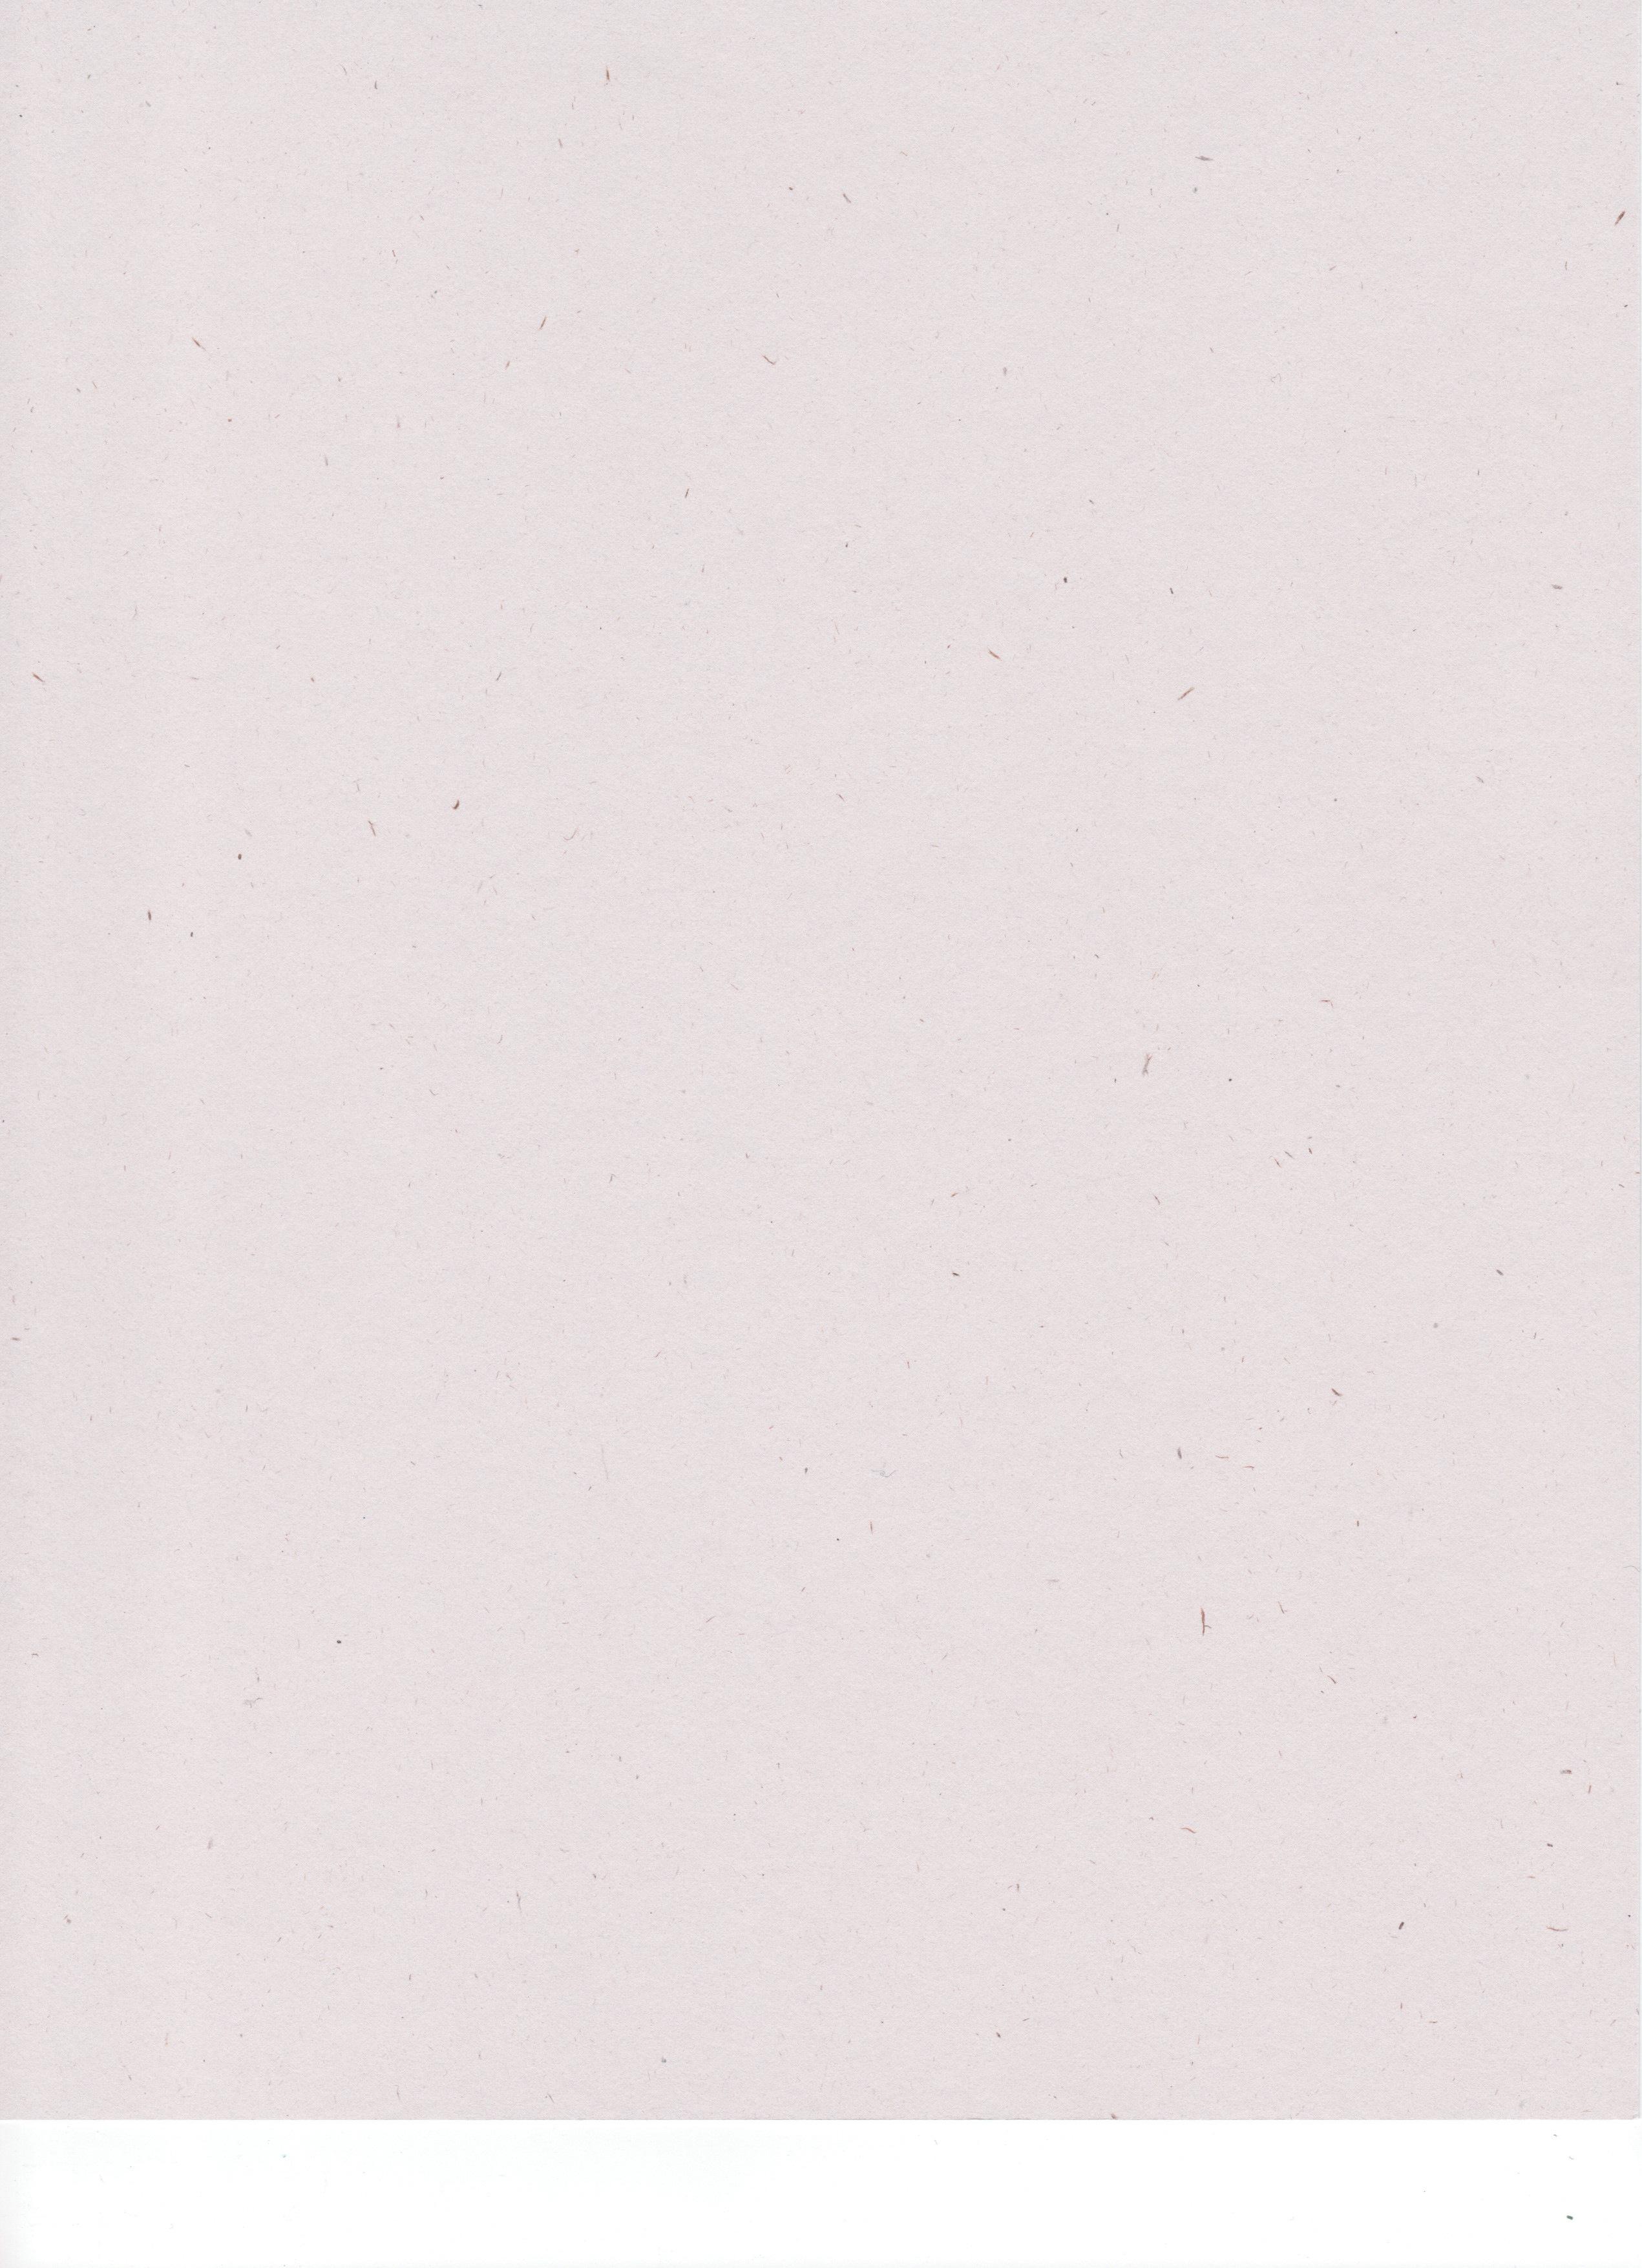 resume paper texture high res by dudeletsgoskate on deviantart